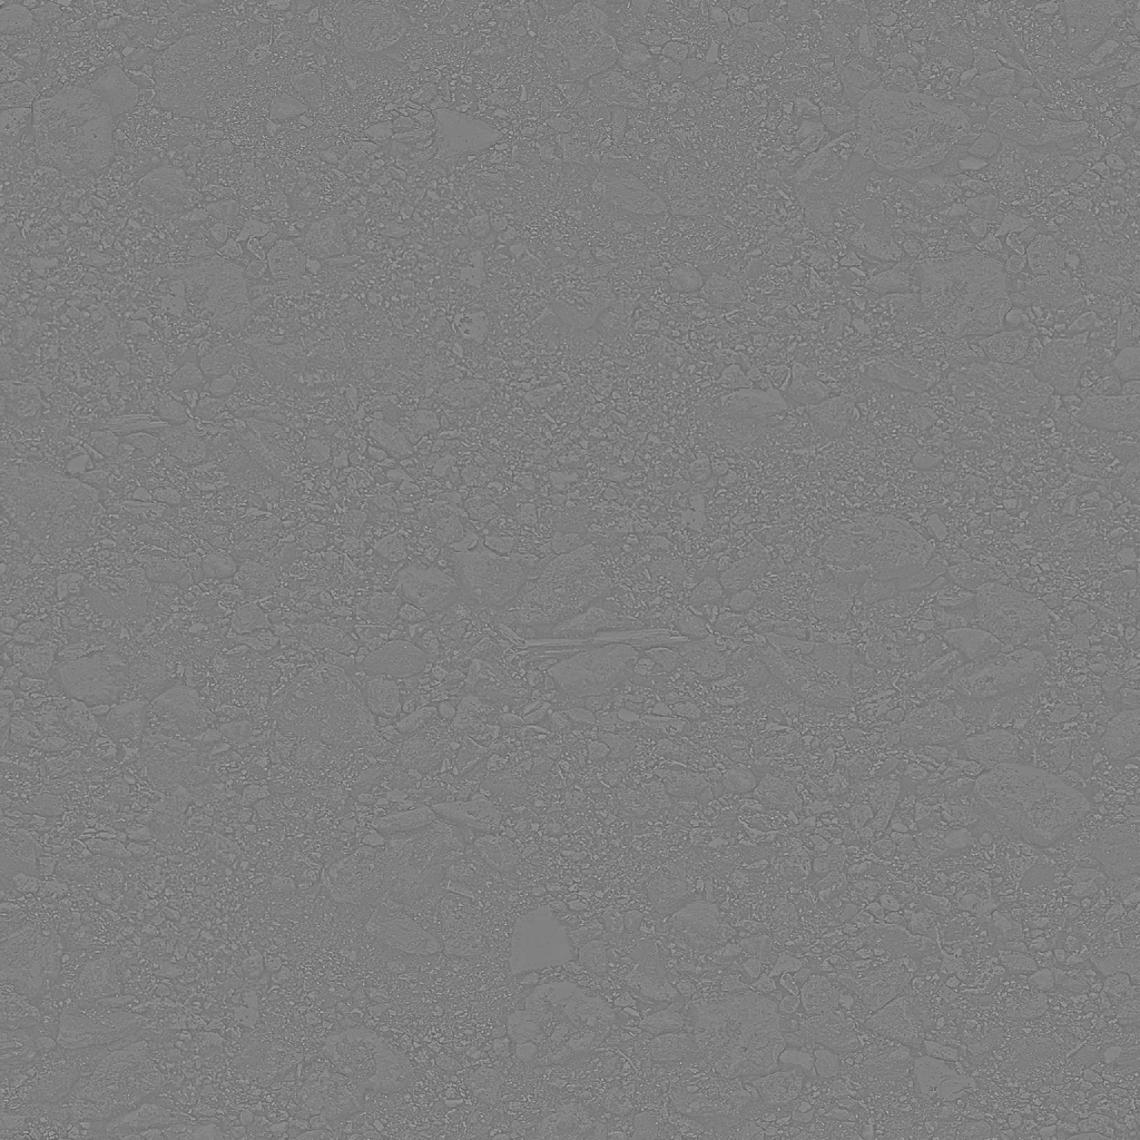 Ground-Stoney-02-Curvature